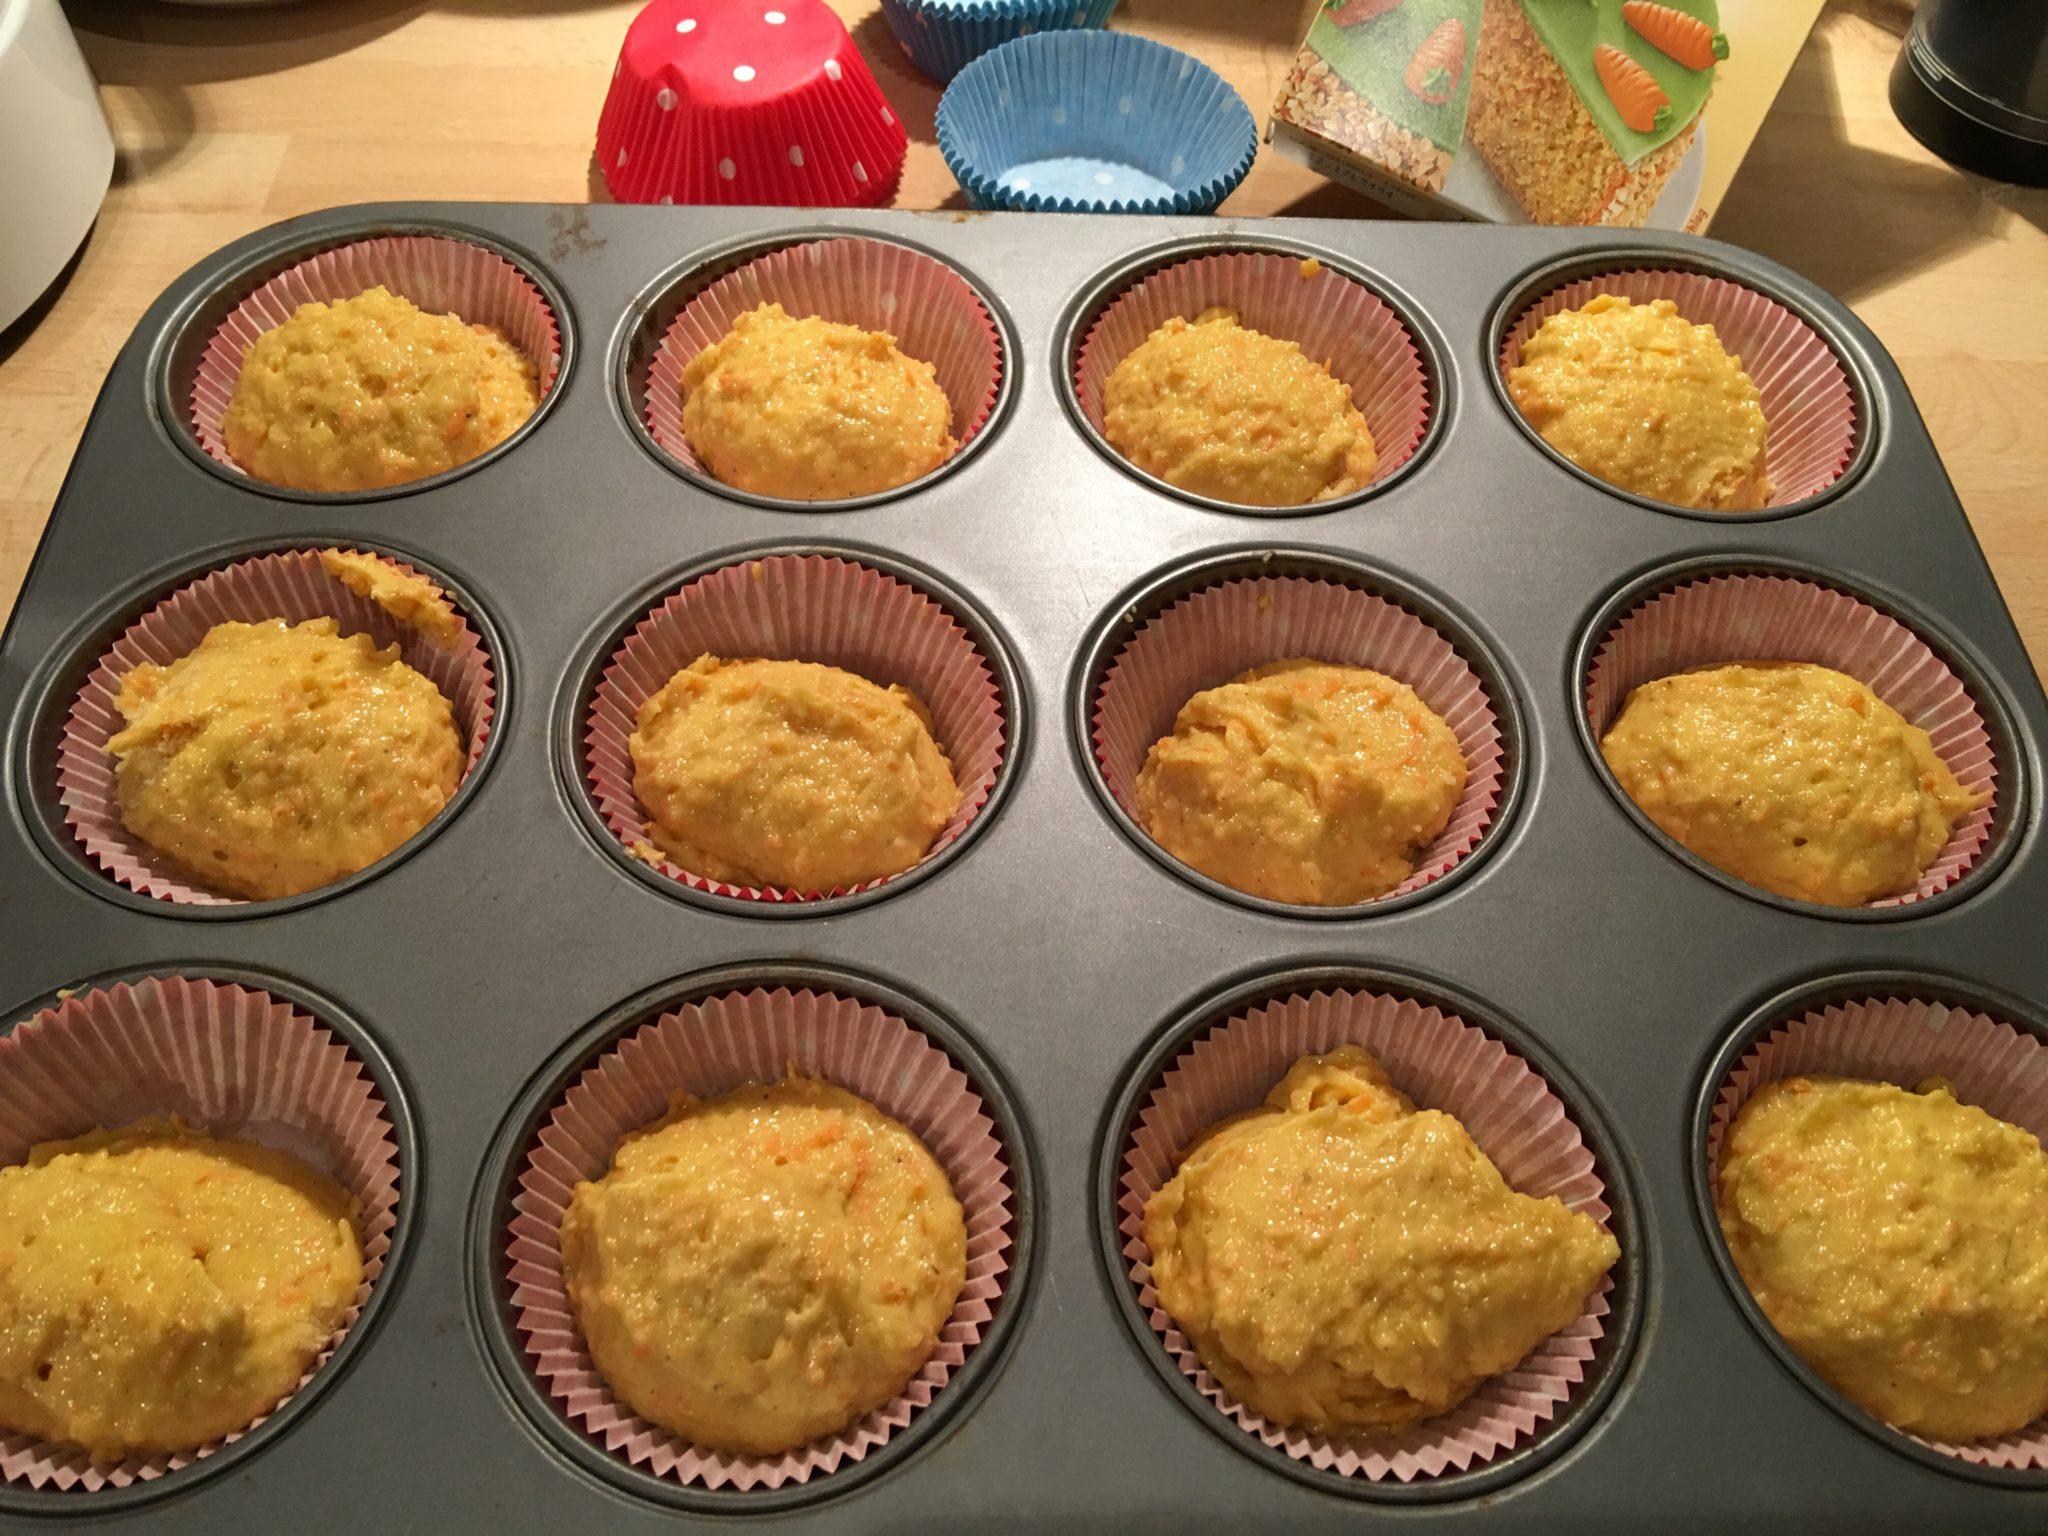 Rübli-Muffins vor dem Backen